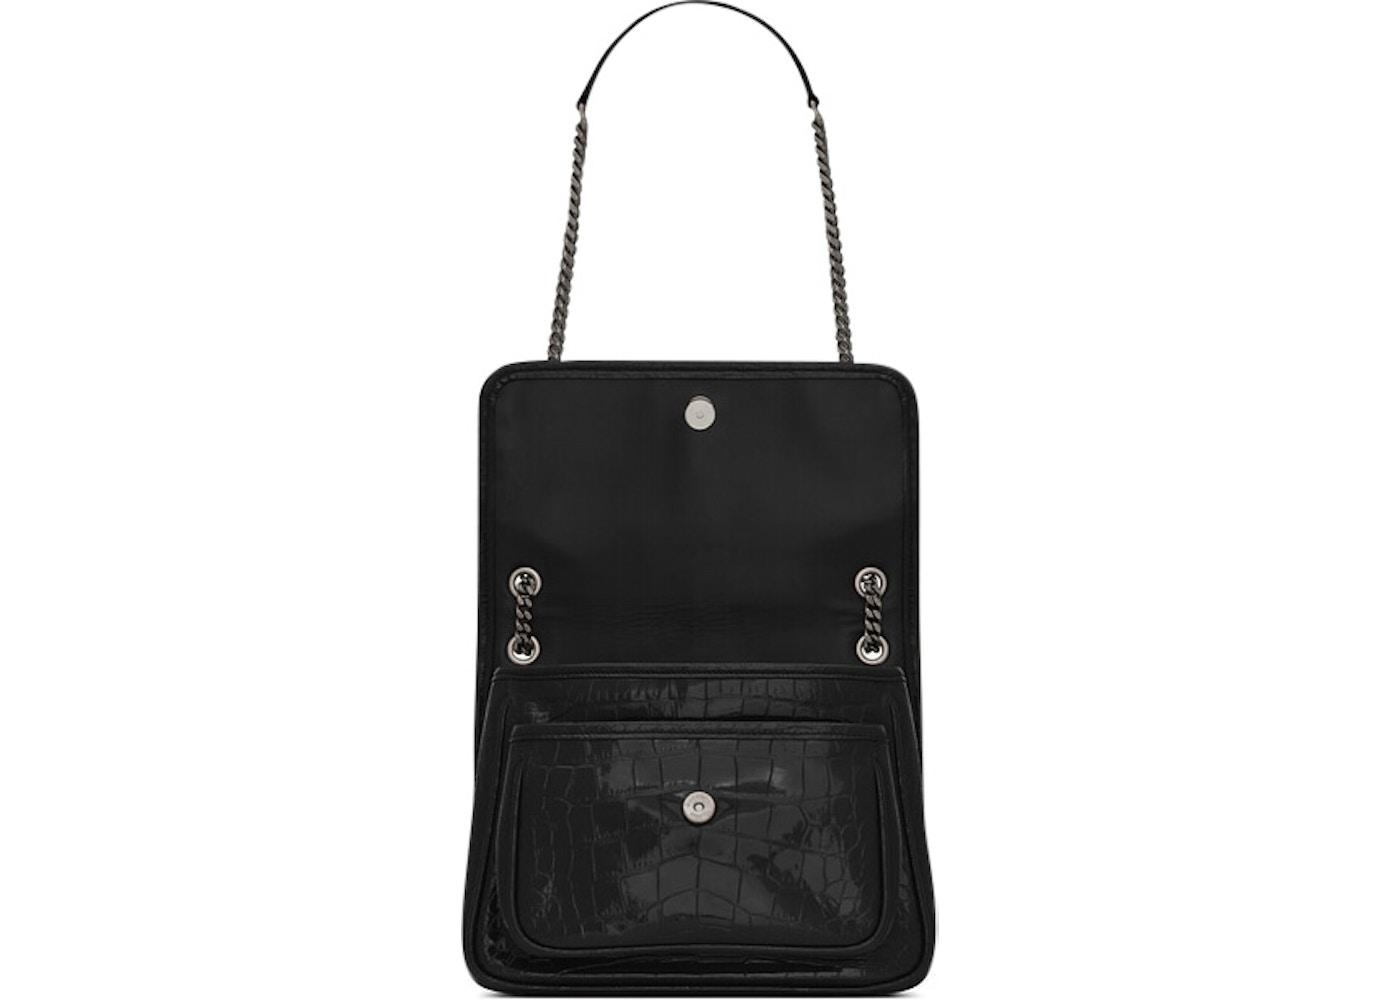 0f5e2942cc4 Saint Laurent Niki Shoulder Bag Crocodile Embossed Patent Leather Baby Black